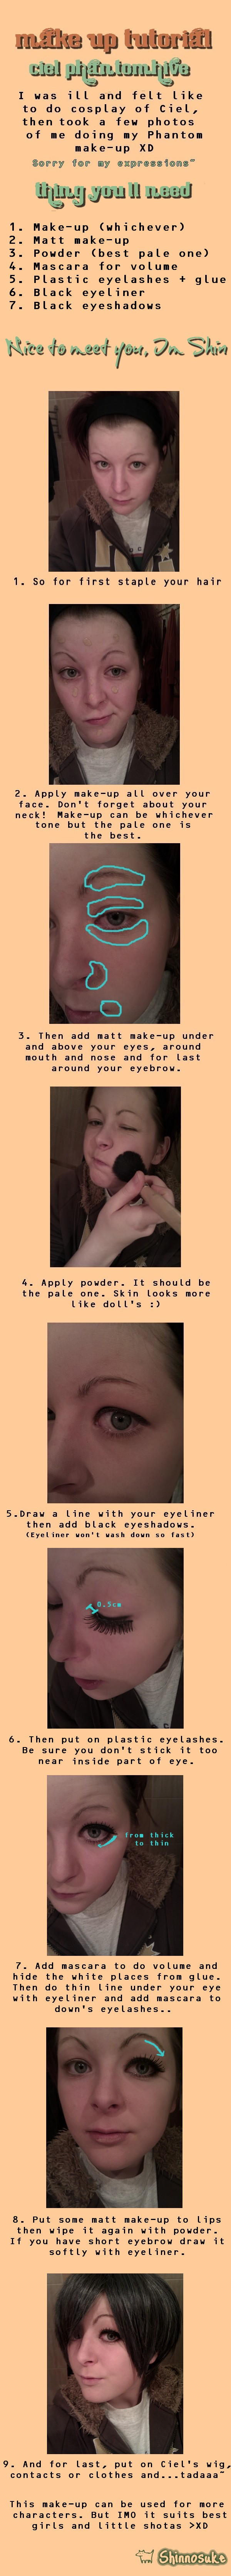 Ciel Phantomhive make-up by SmilingBlackFox